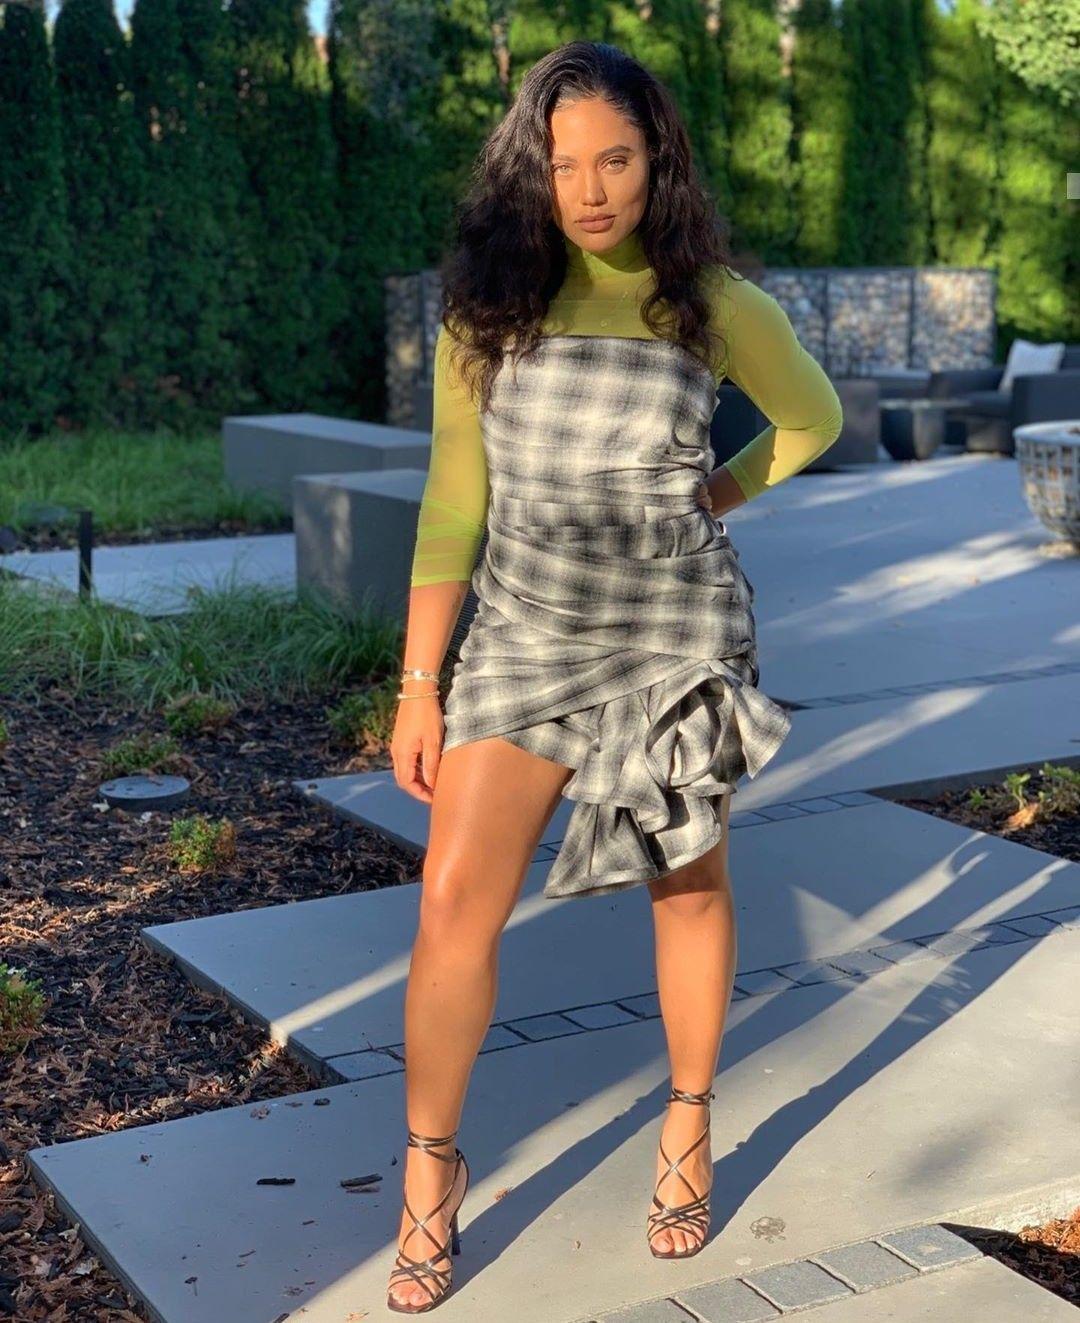 Black Fashion Models Poses: Fashion Photography Poses, Fashion, Black